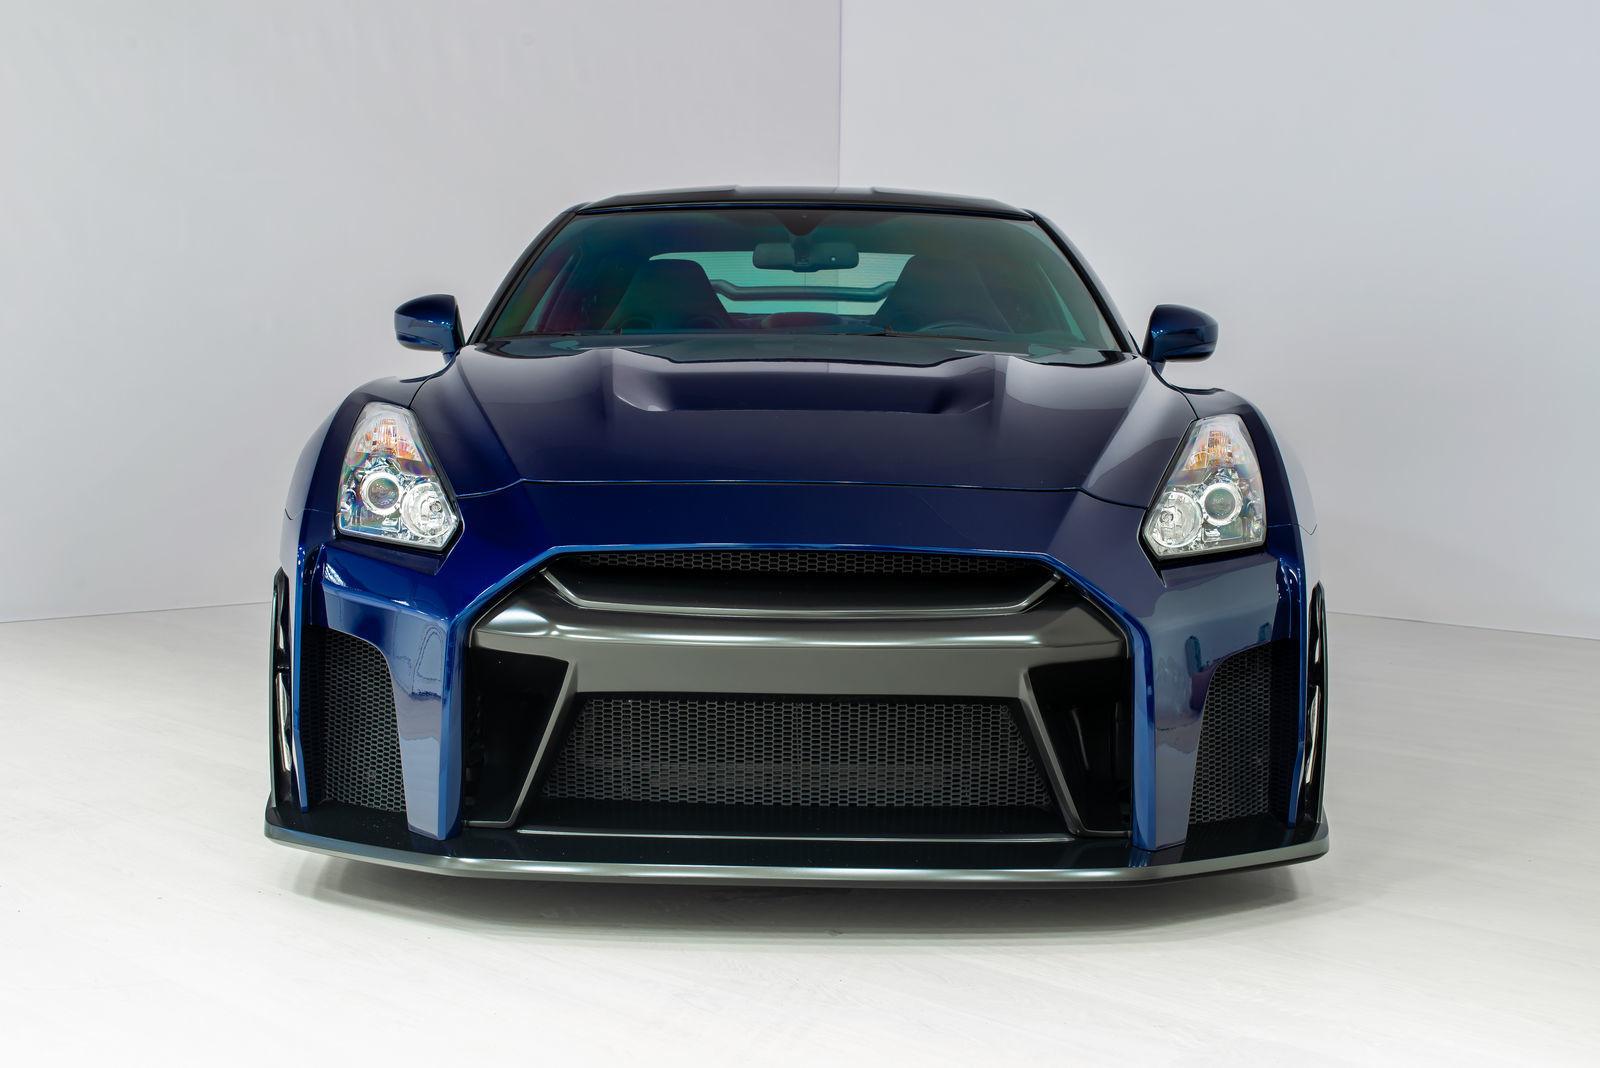 SCL PERFORMANCE GLOBAL body kit for Nissan GT-R GOJIRA New model